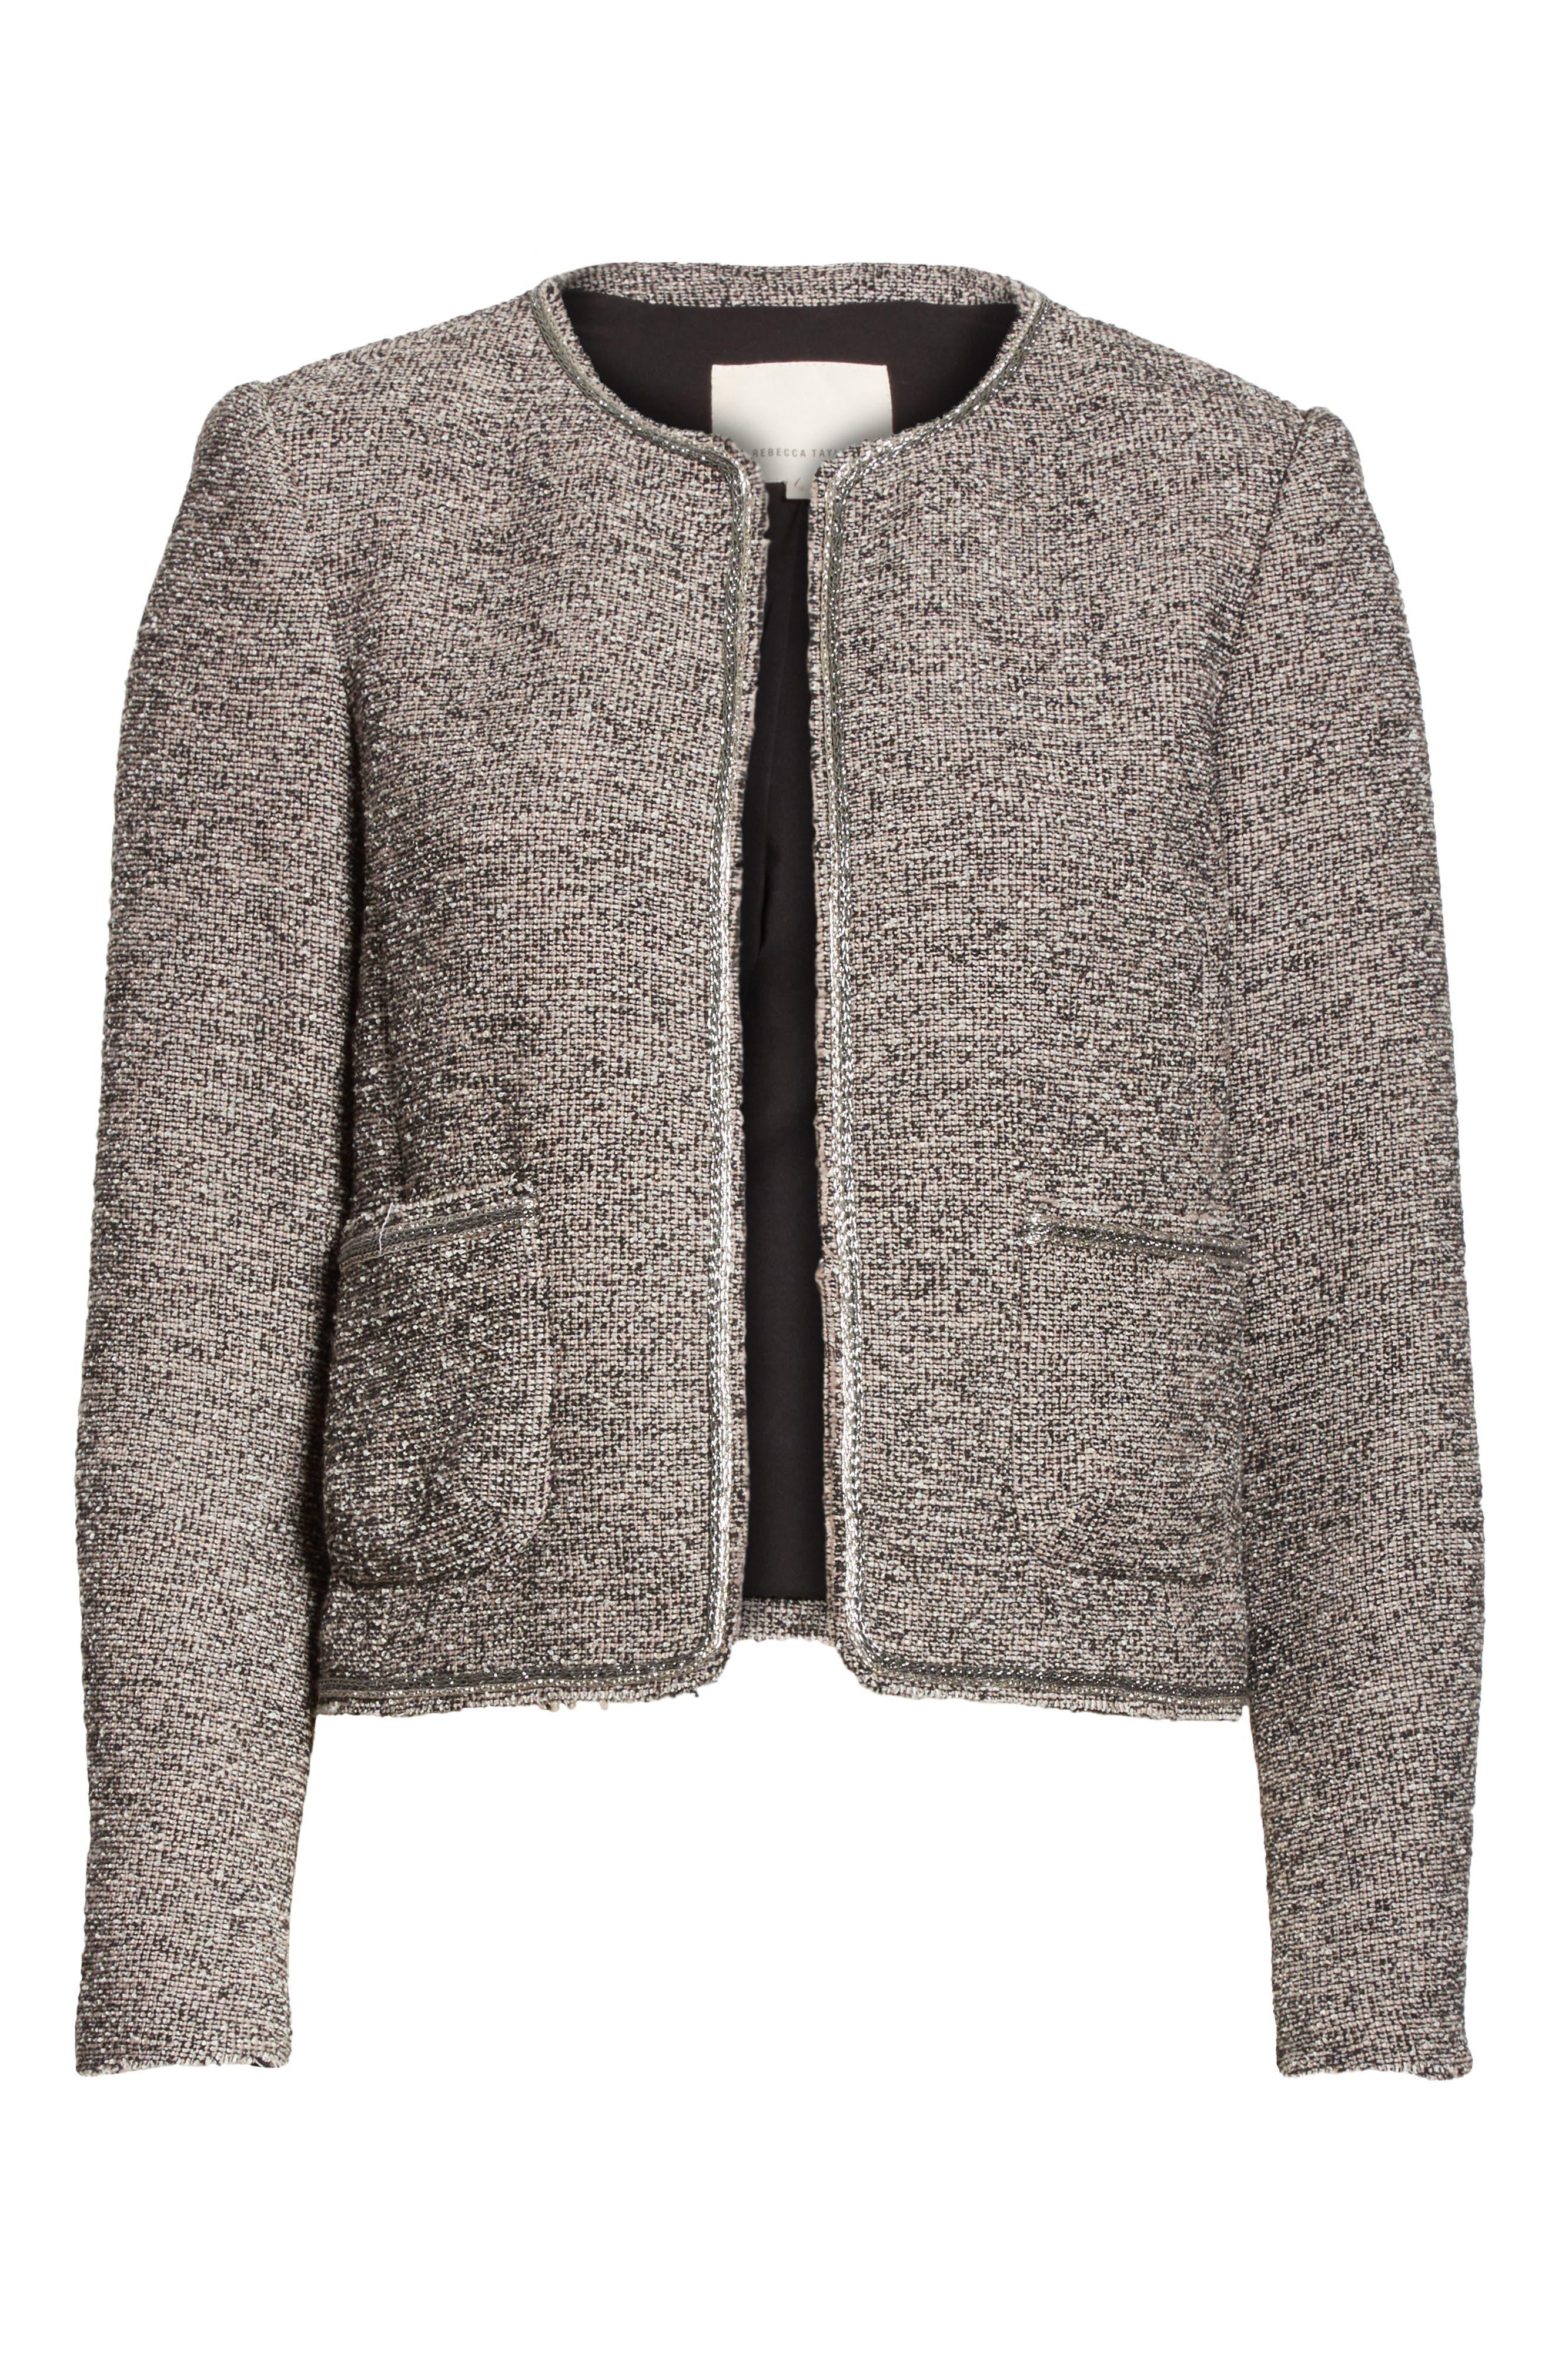 Embellished Stretch Tweed Jacket,                             Alternate thumbnail 6, color,                             Nude Combo